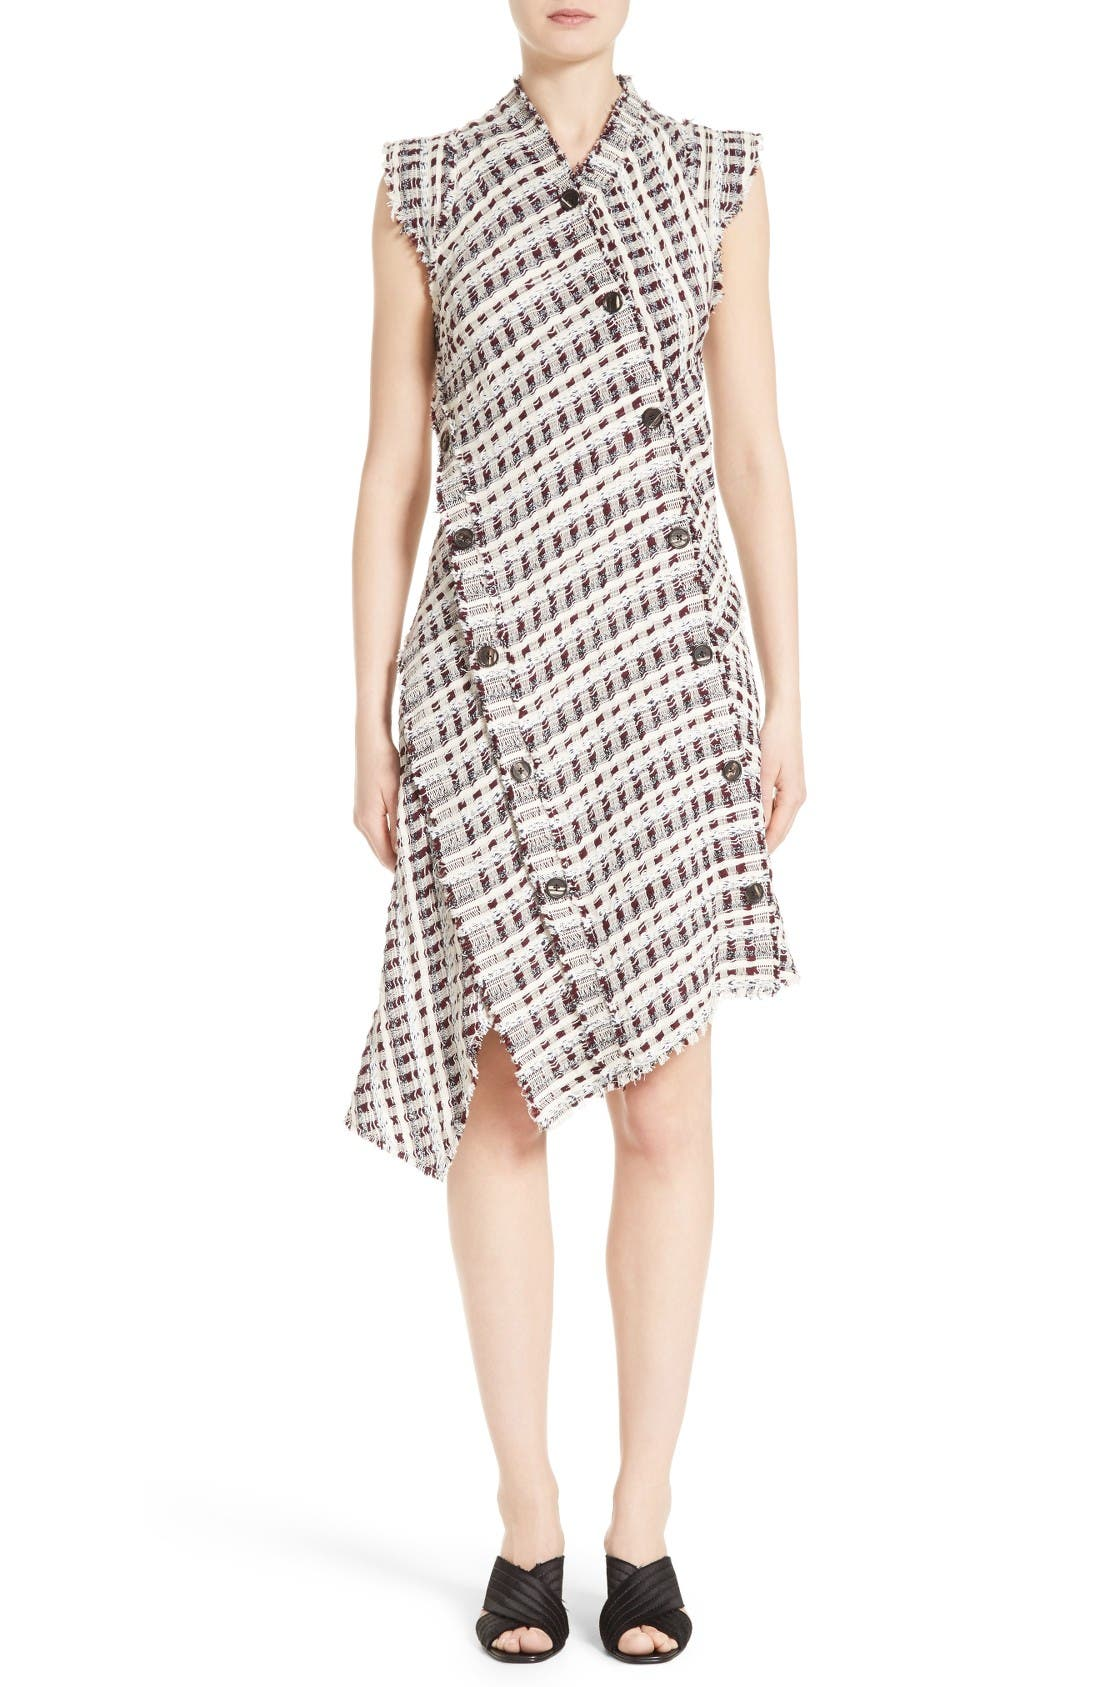 Alternate Image 1 Selected - Proenza Schouler Asymmetrical Tweed Dress